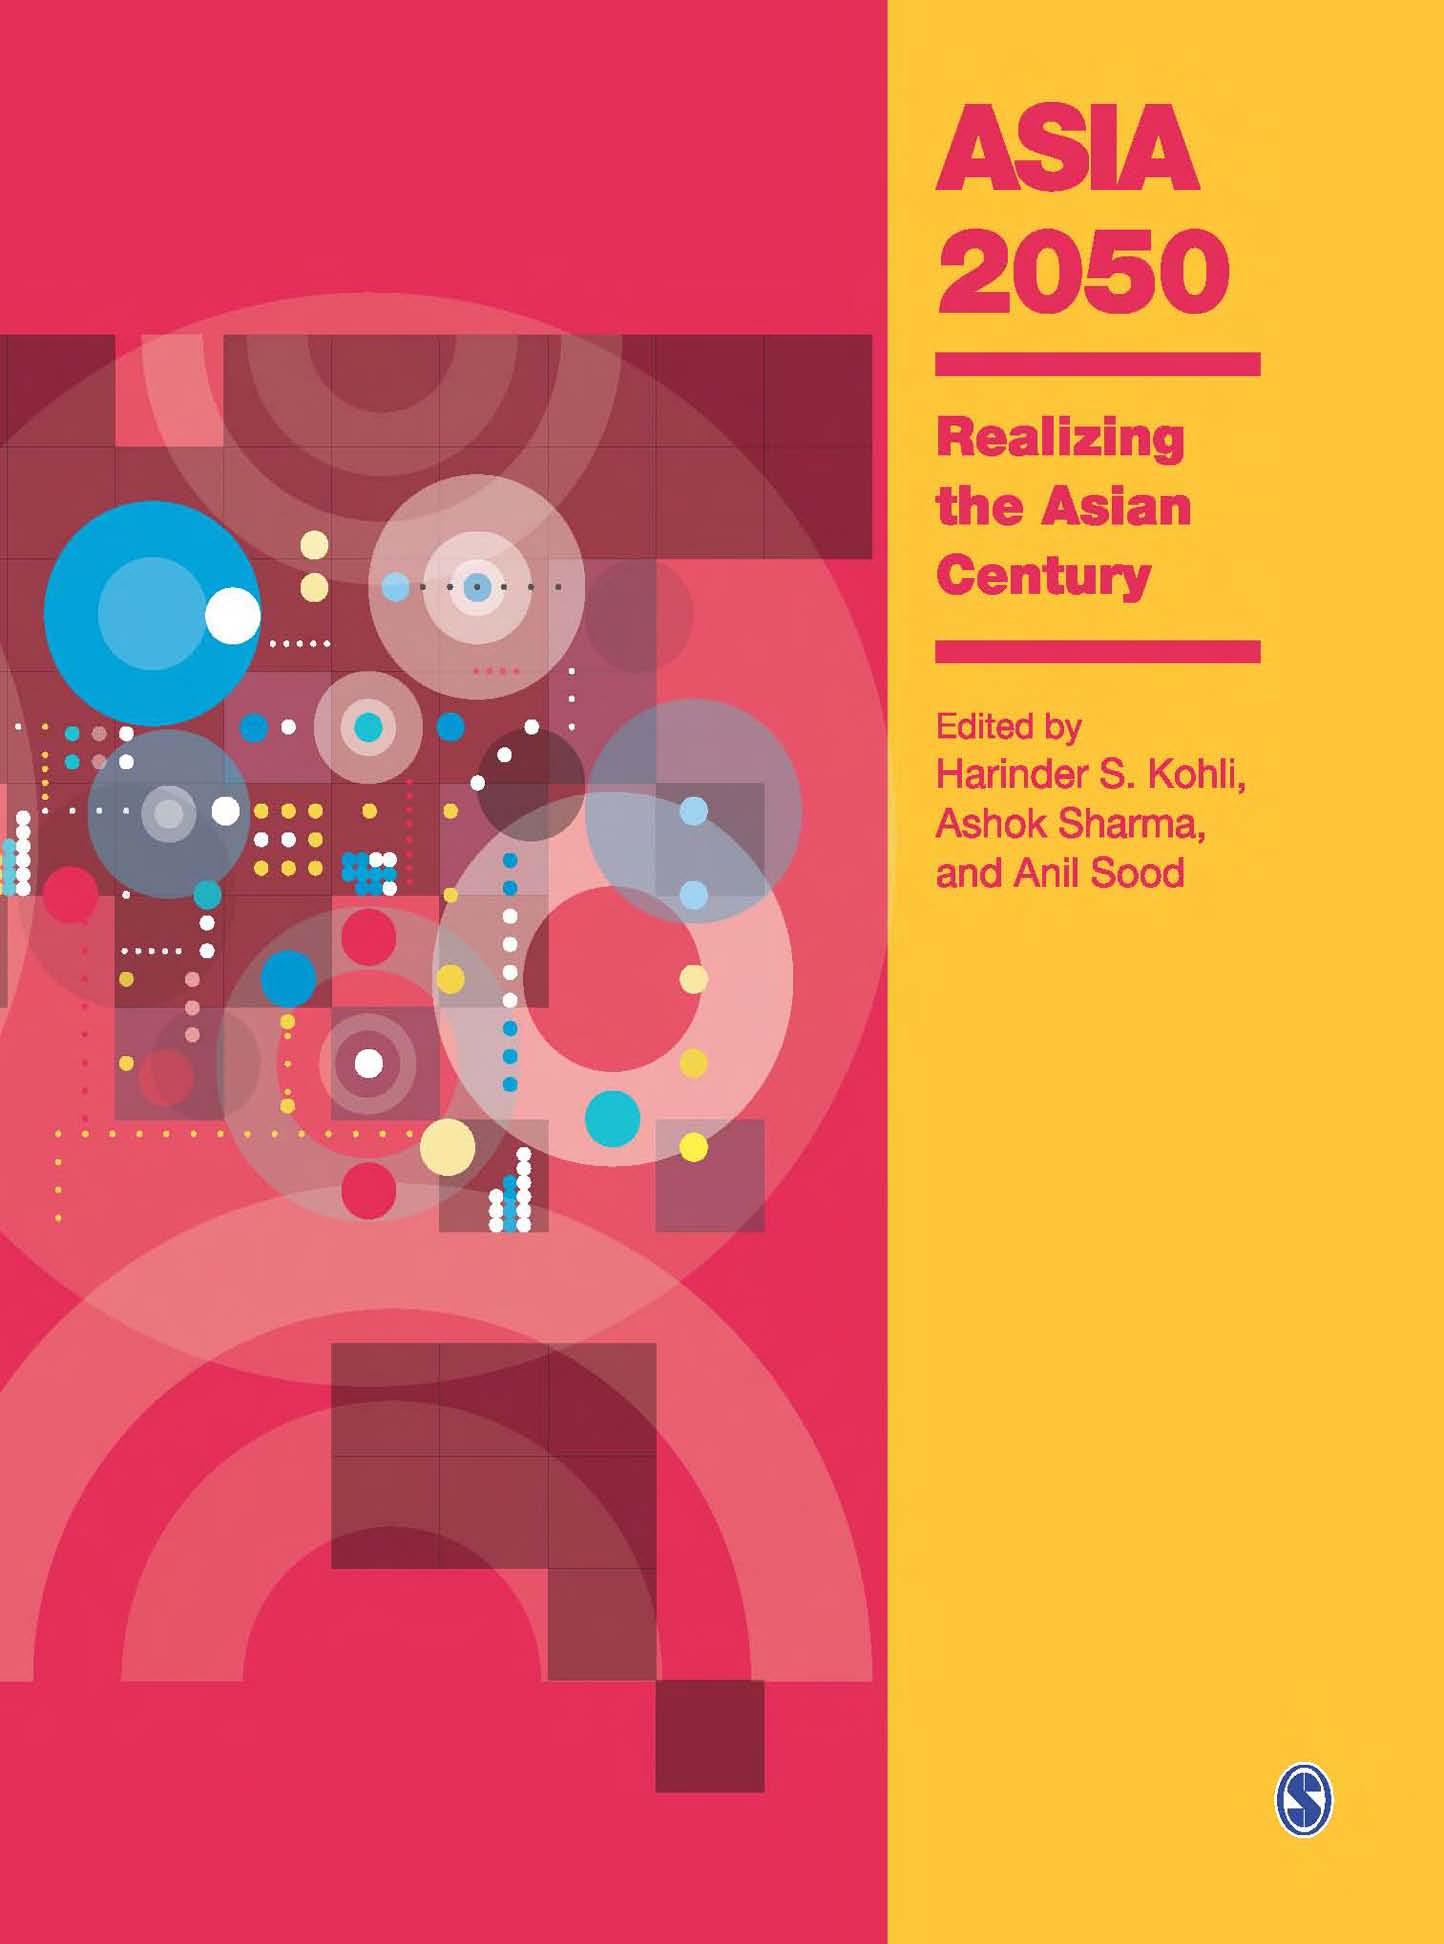 Download Ebook Asia 2050 by Harinder S Kohli Pdf